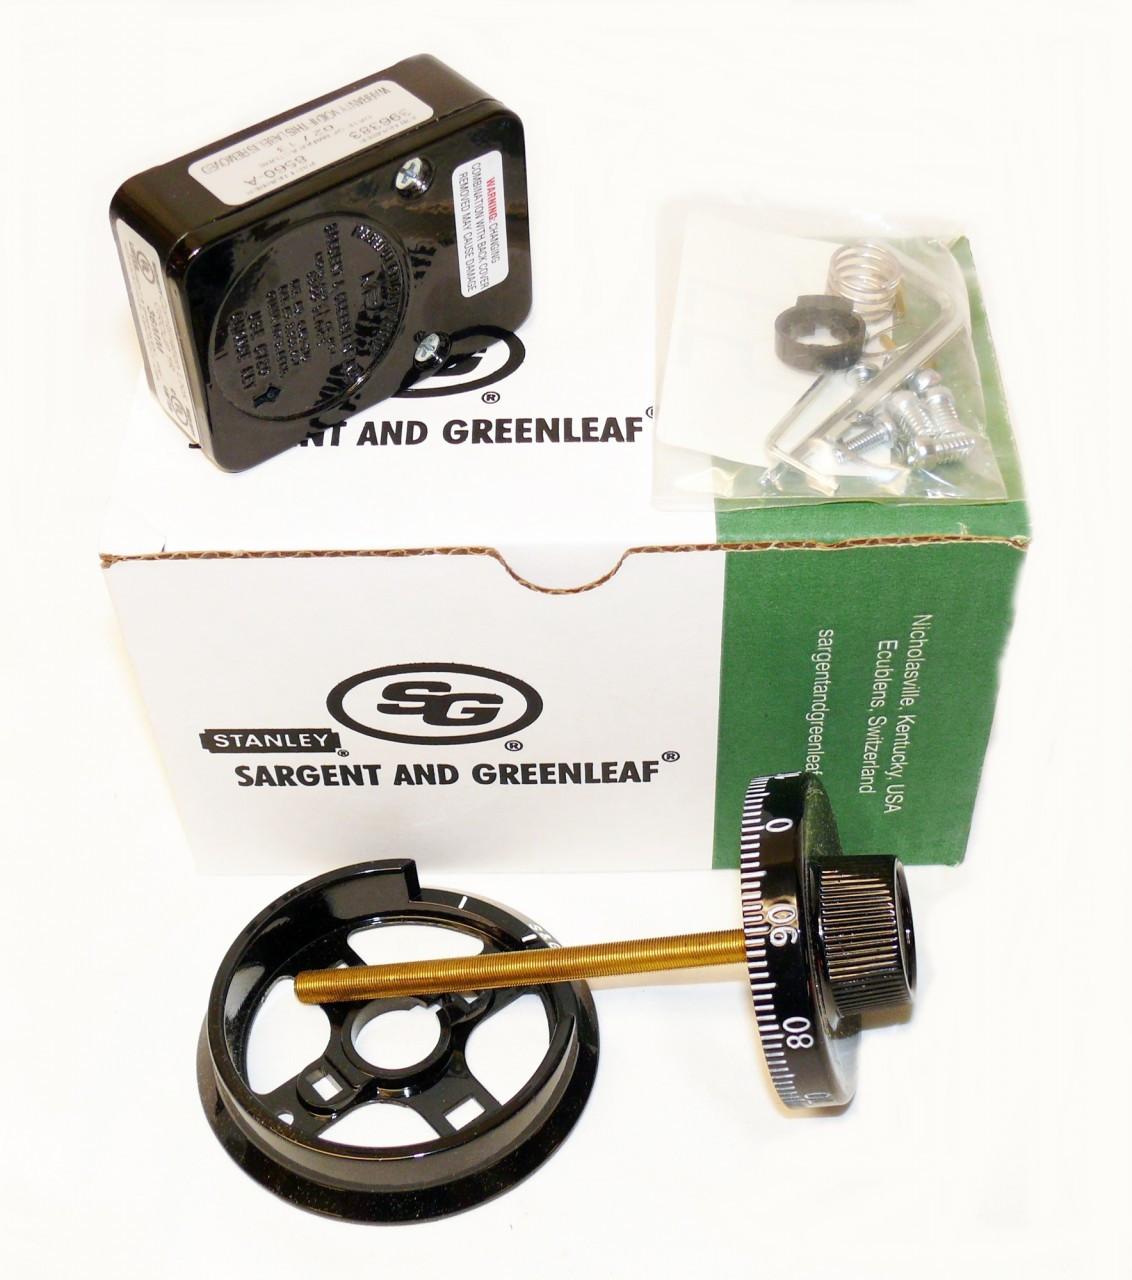 Sargent And Greenleaf Safe Wiring Diagram Diagrams By Locks Safeandlockstore Group 1r Lock Package Vintage